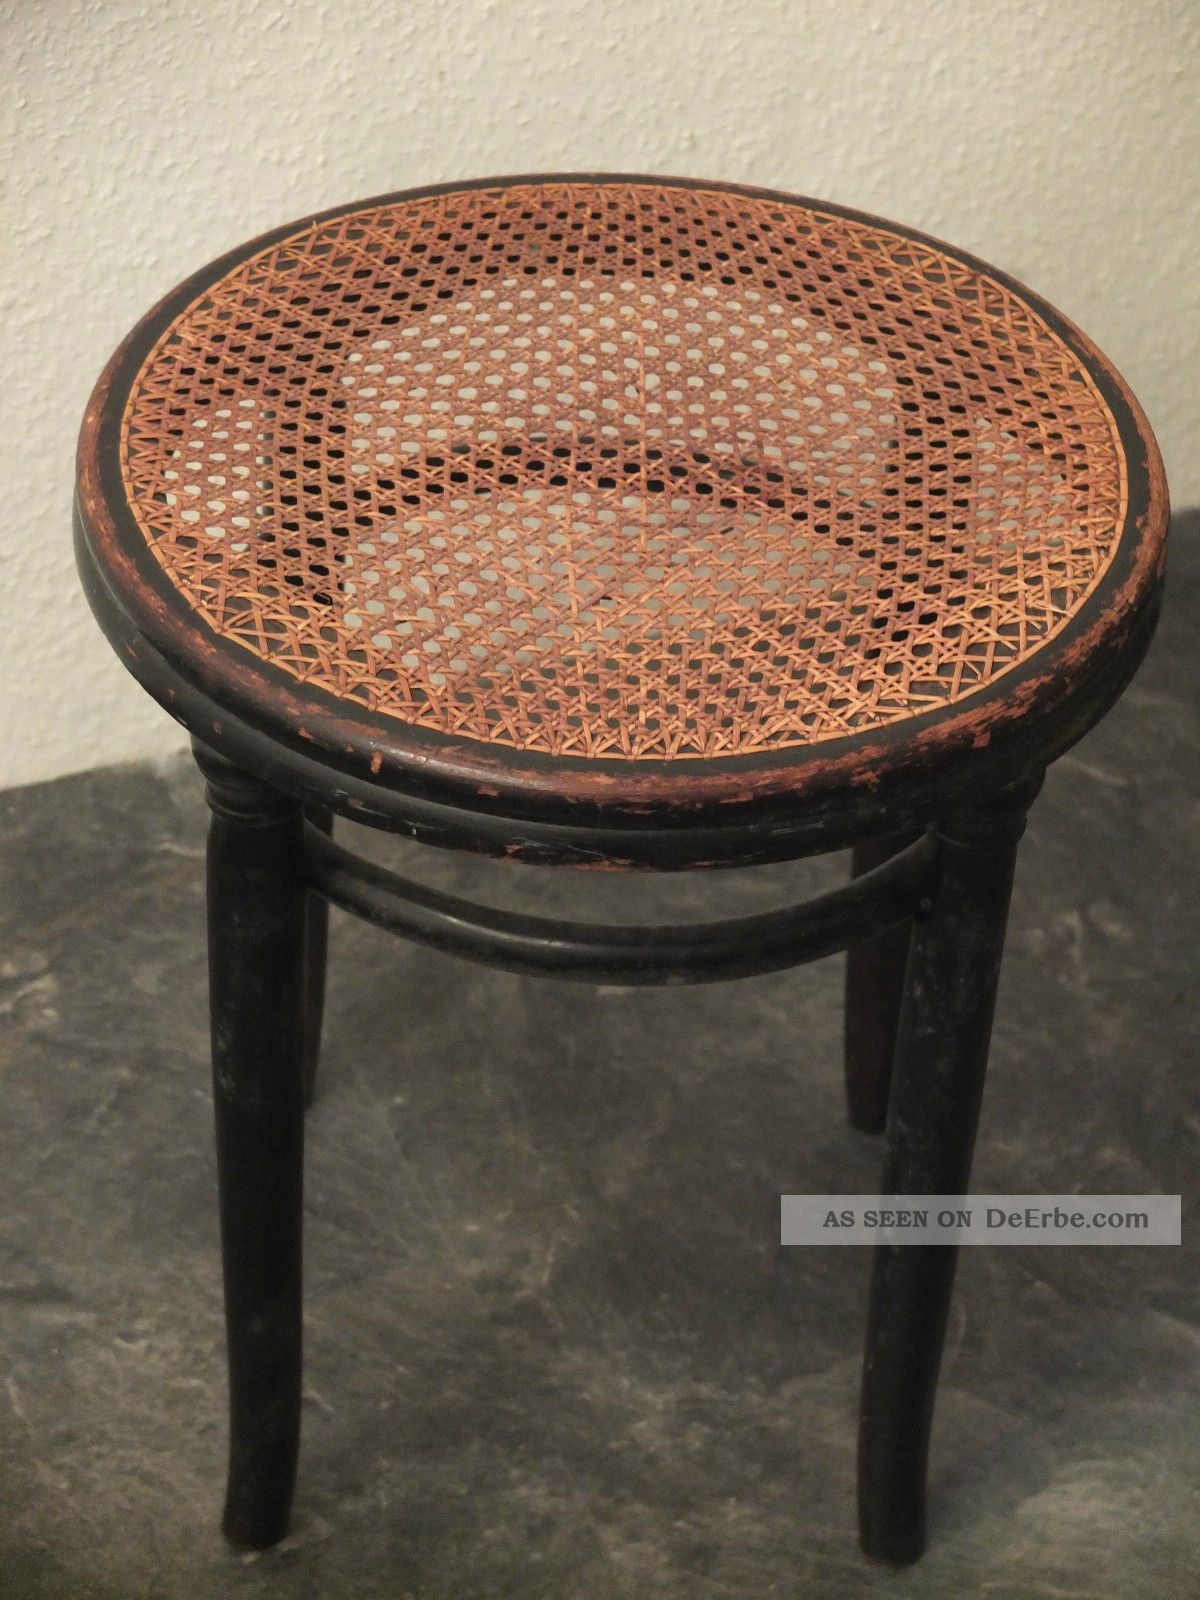 thonet hocker mit geflecht kaffeehaus stuhl bugholz mit stempel. Black Bedroom Furniture Sets. Home Design Ideas